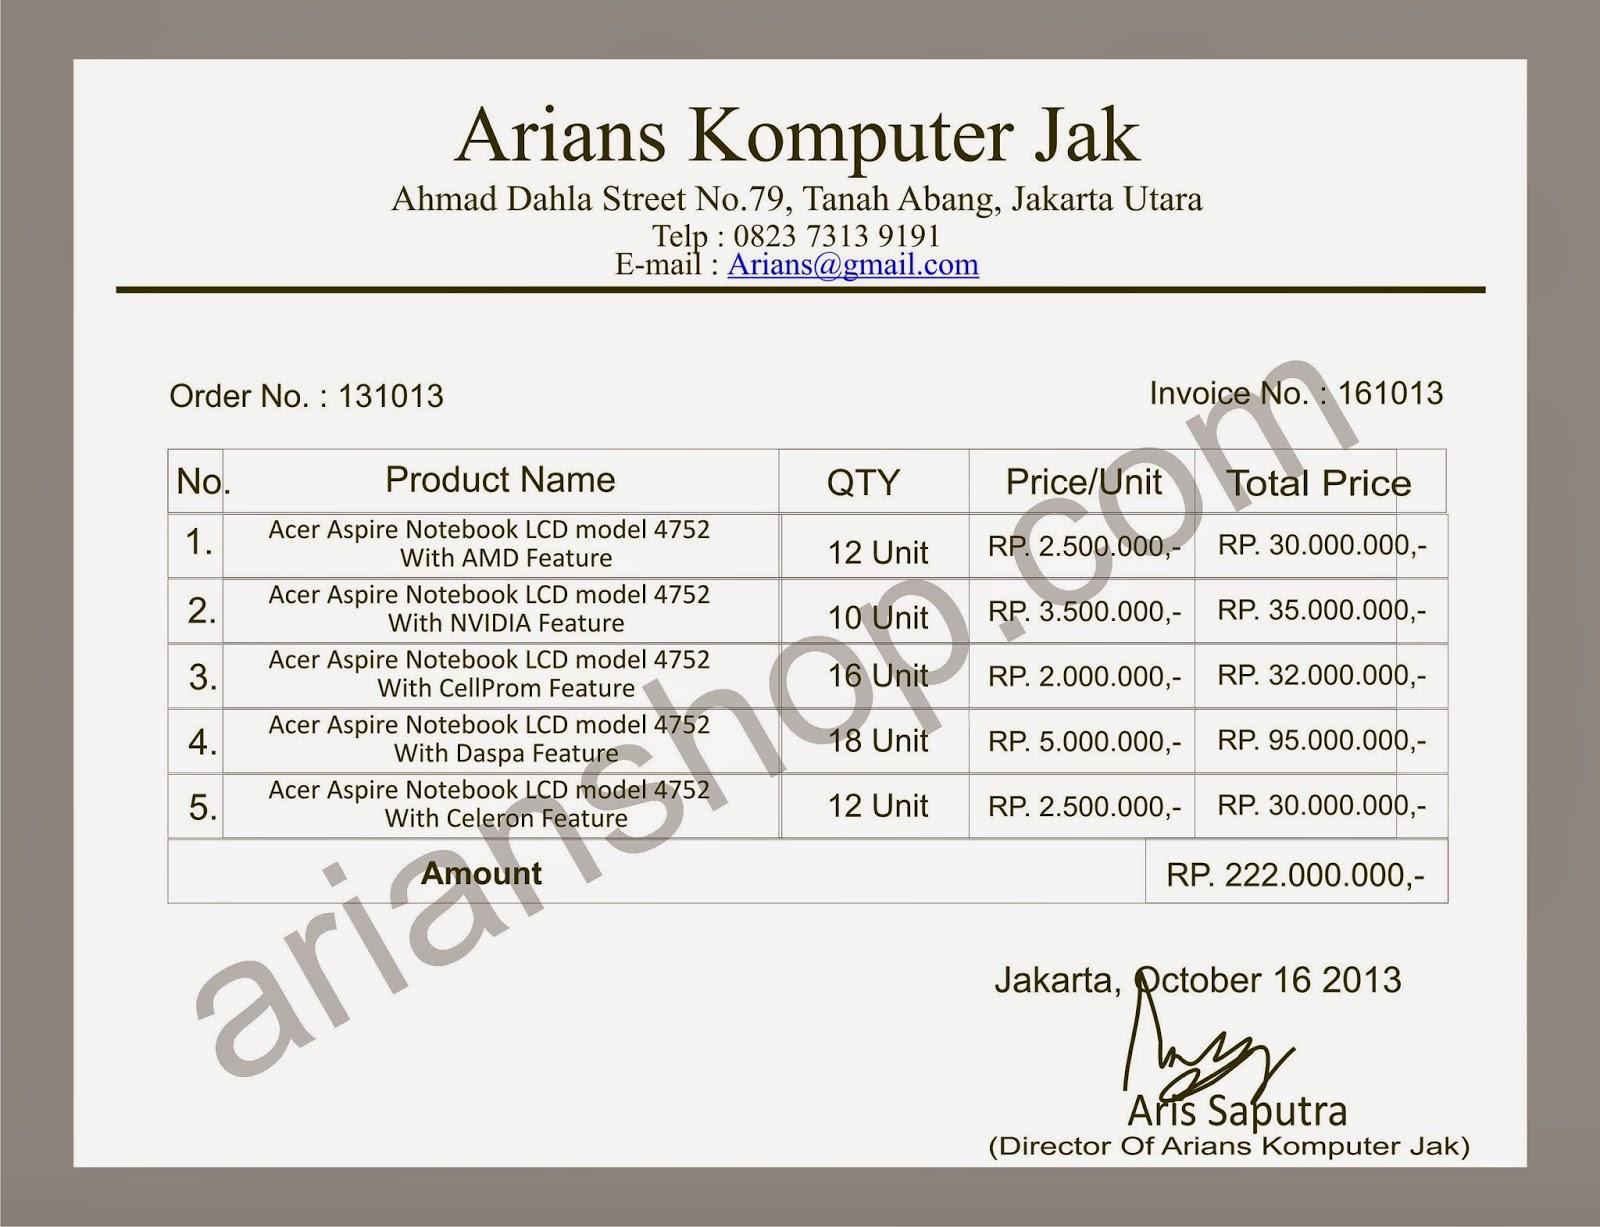 contoh invoice invoice adalah daftar atau keterangan barang barang ...